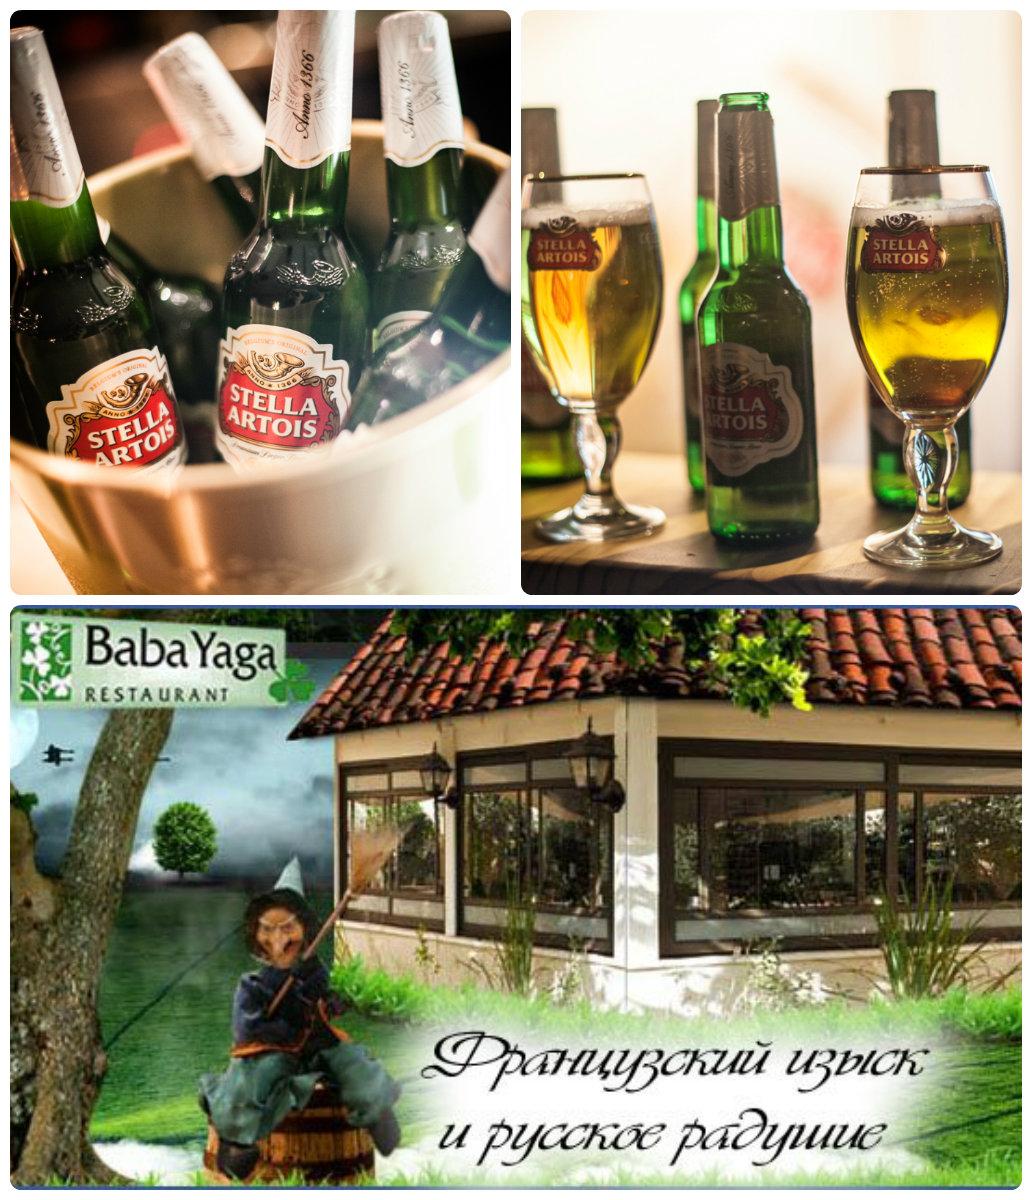 Stella Artois и ресторан «Баба-Яга»